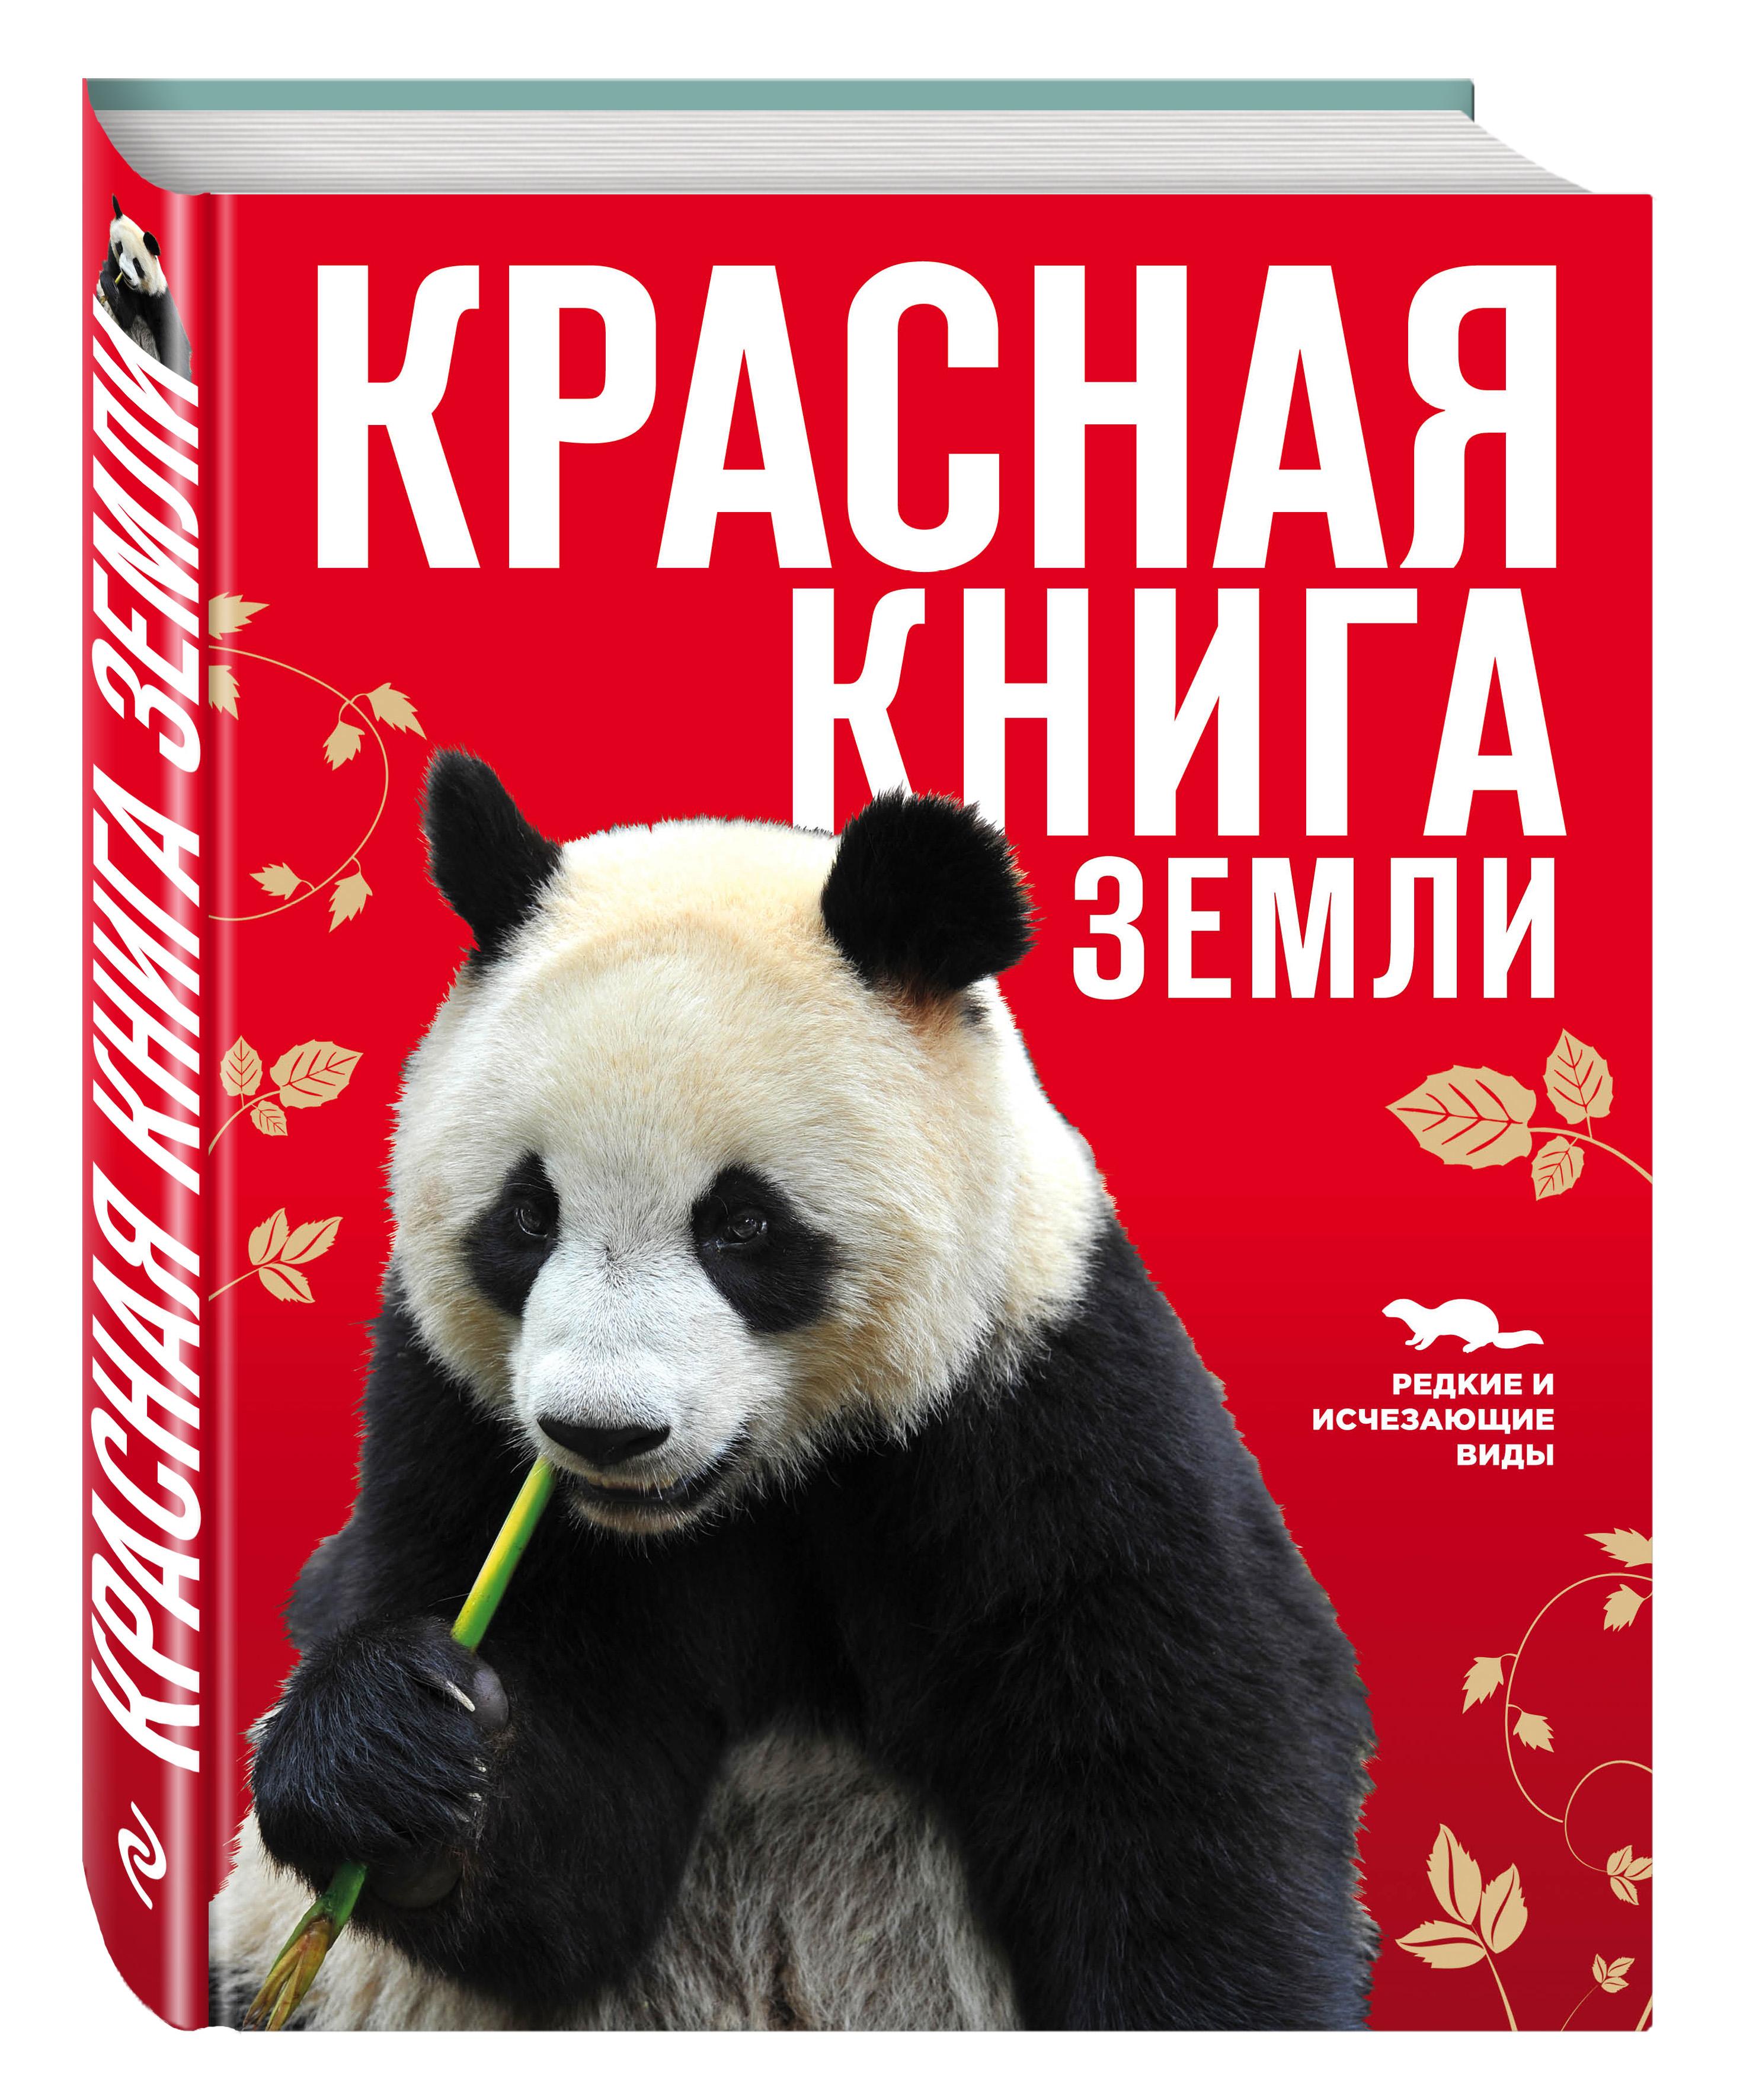 Красная книга Земли (новое оформление) ( Скалдина О.В., Слиж Е.А.  )